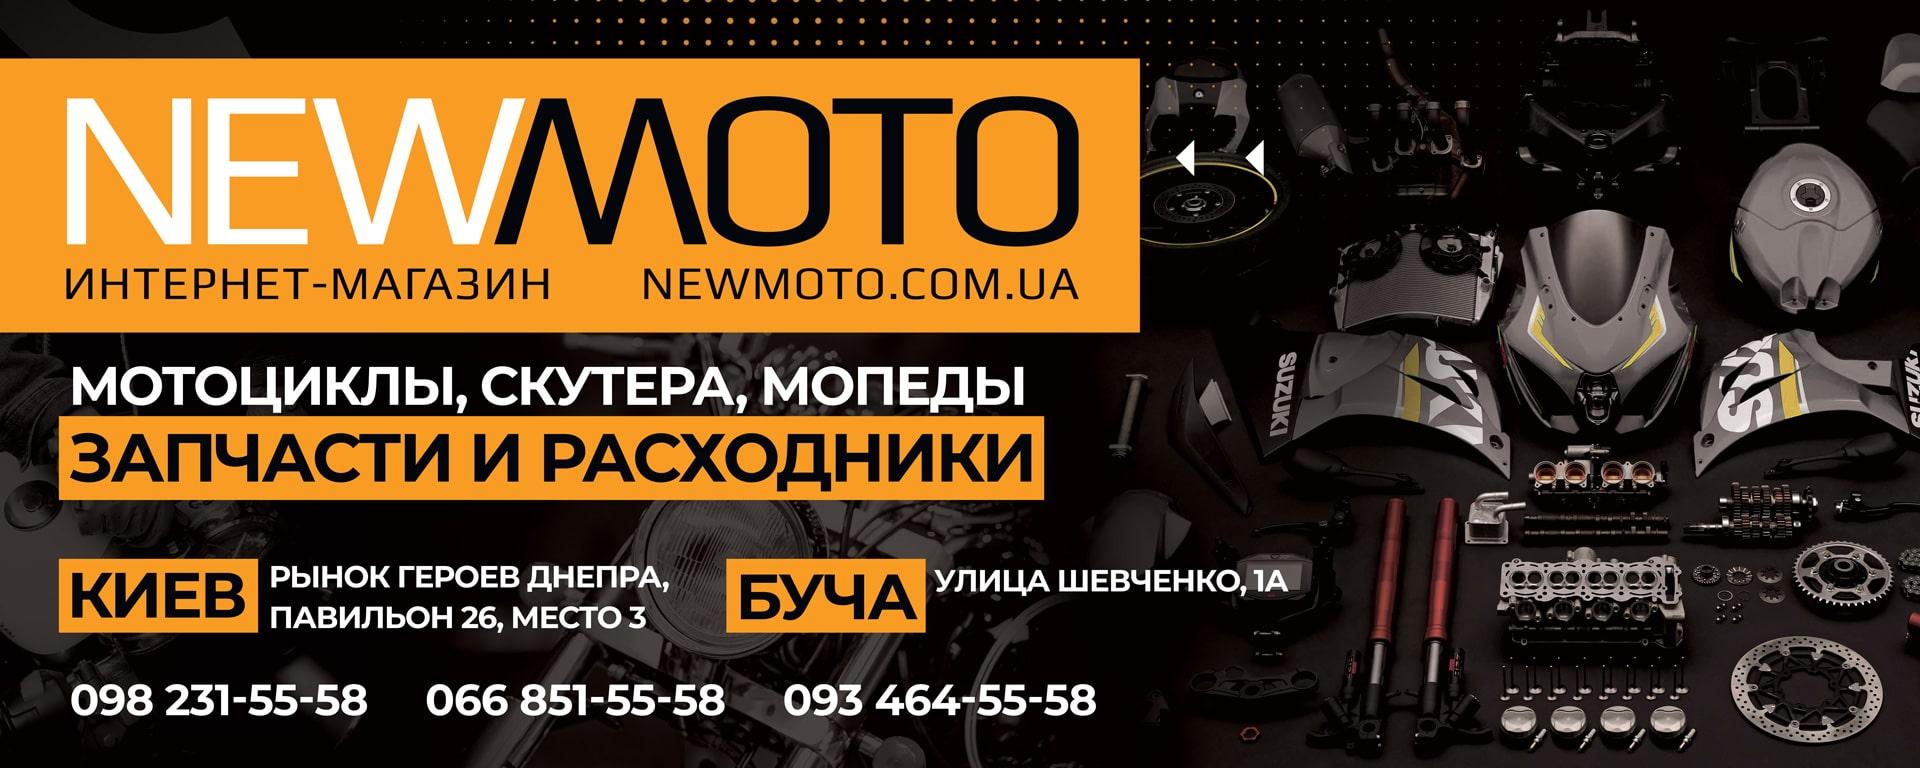 NewMoto